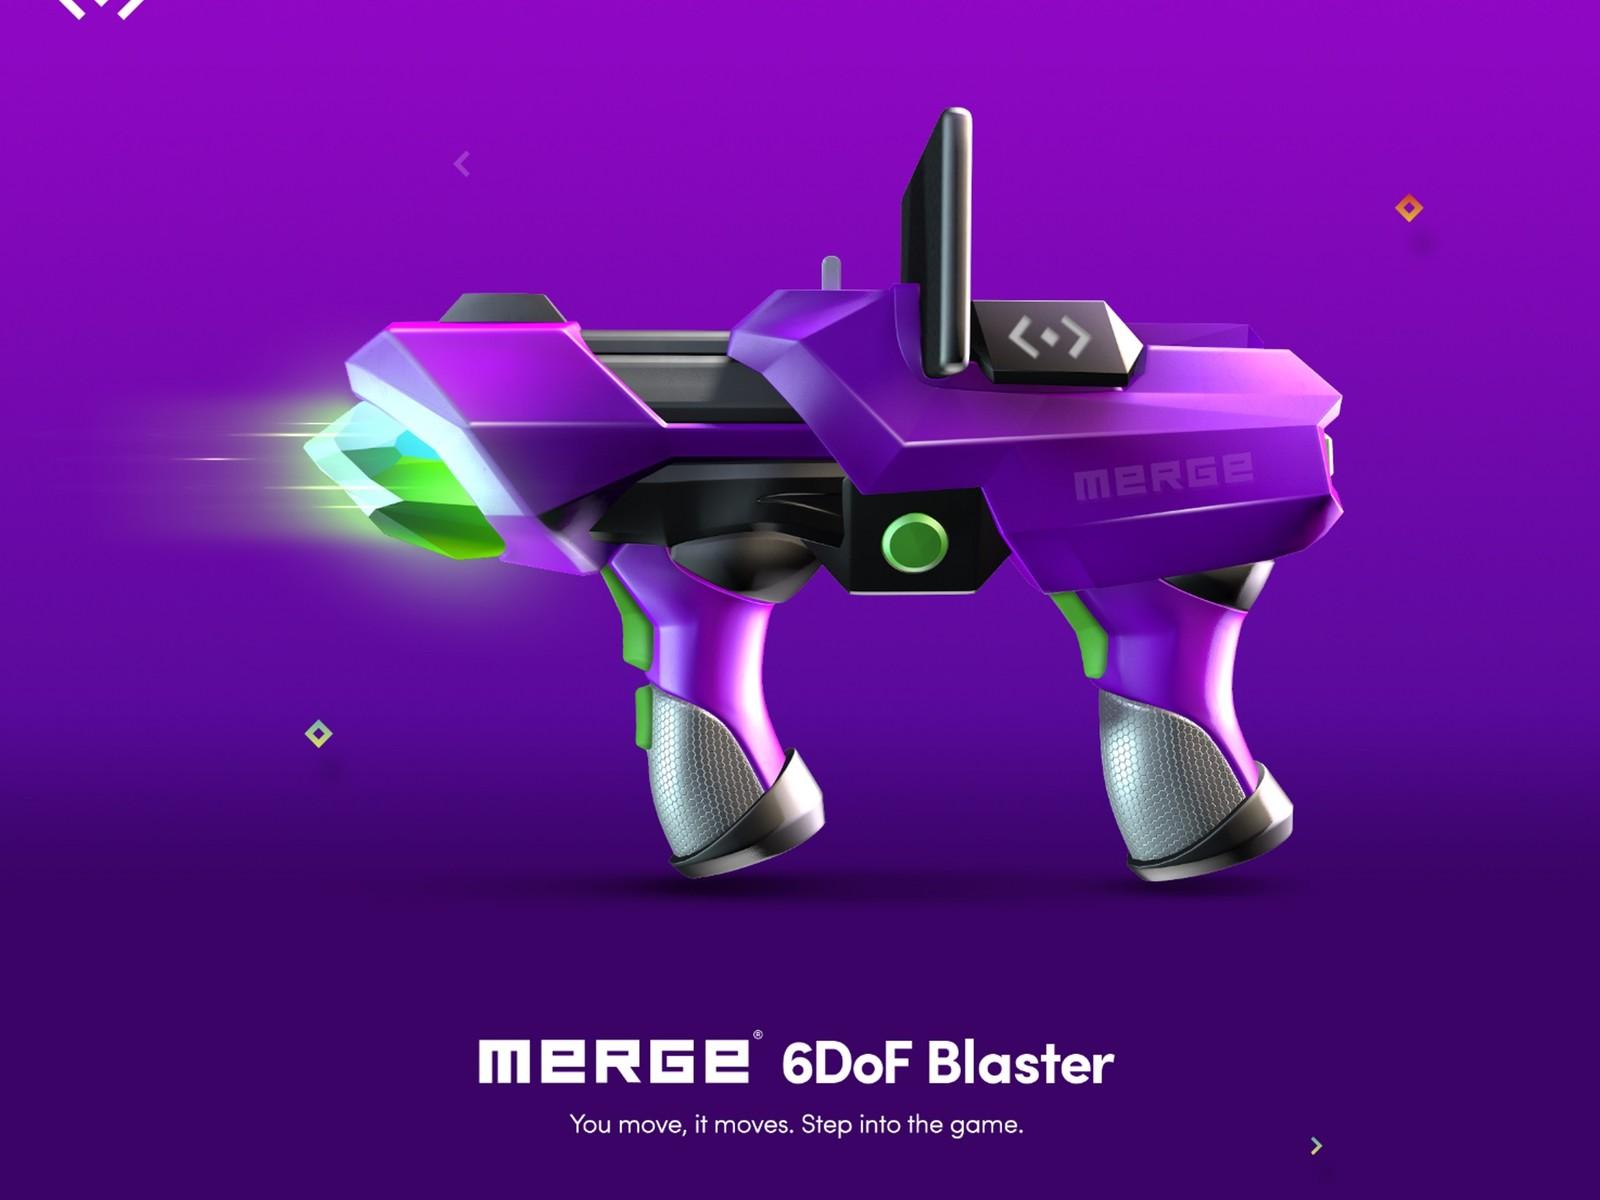 Merge Blaster